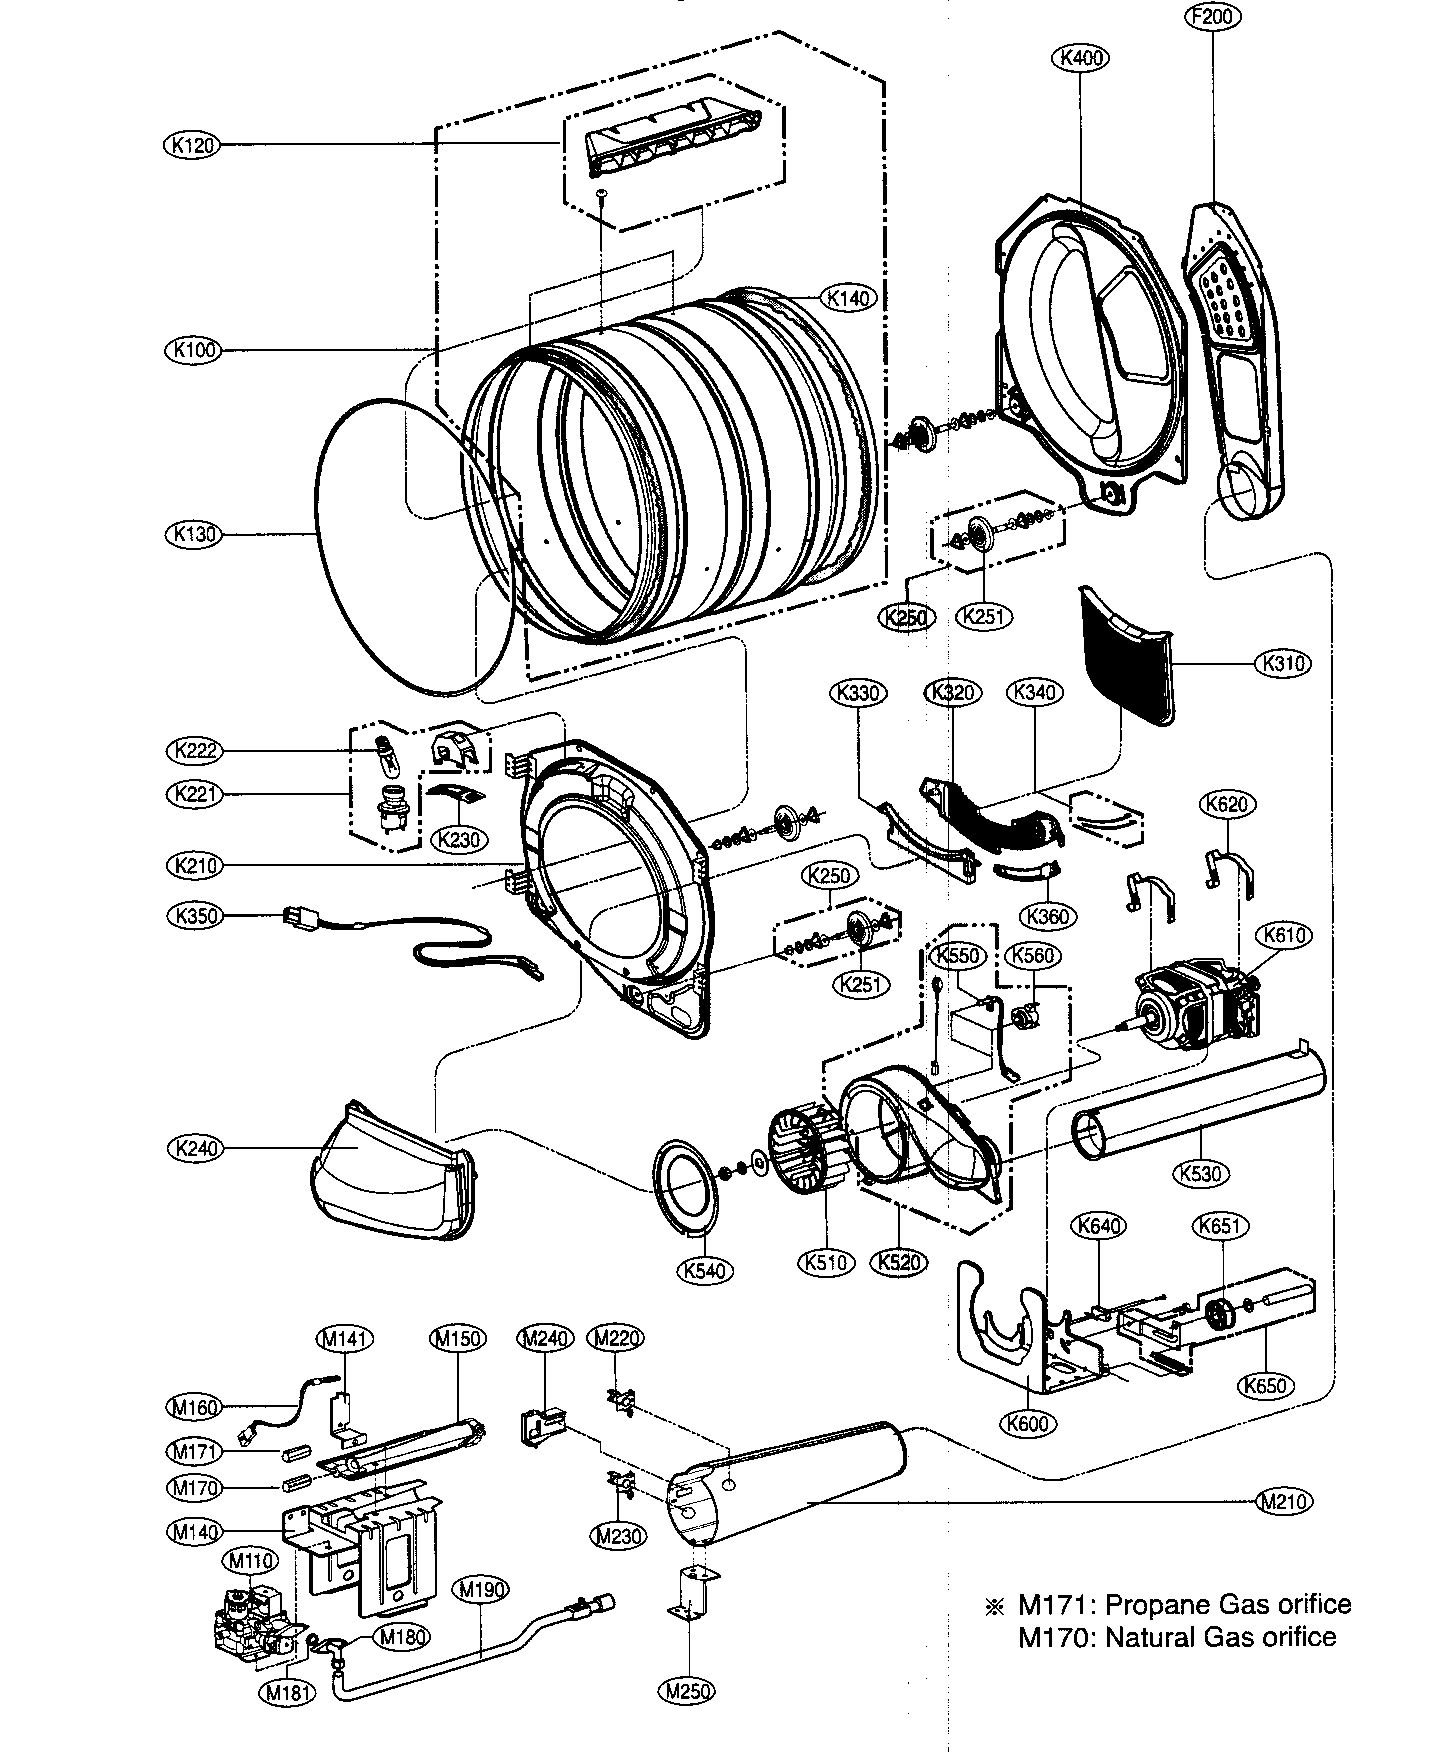 snare drum parts diagram picture pictures